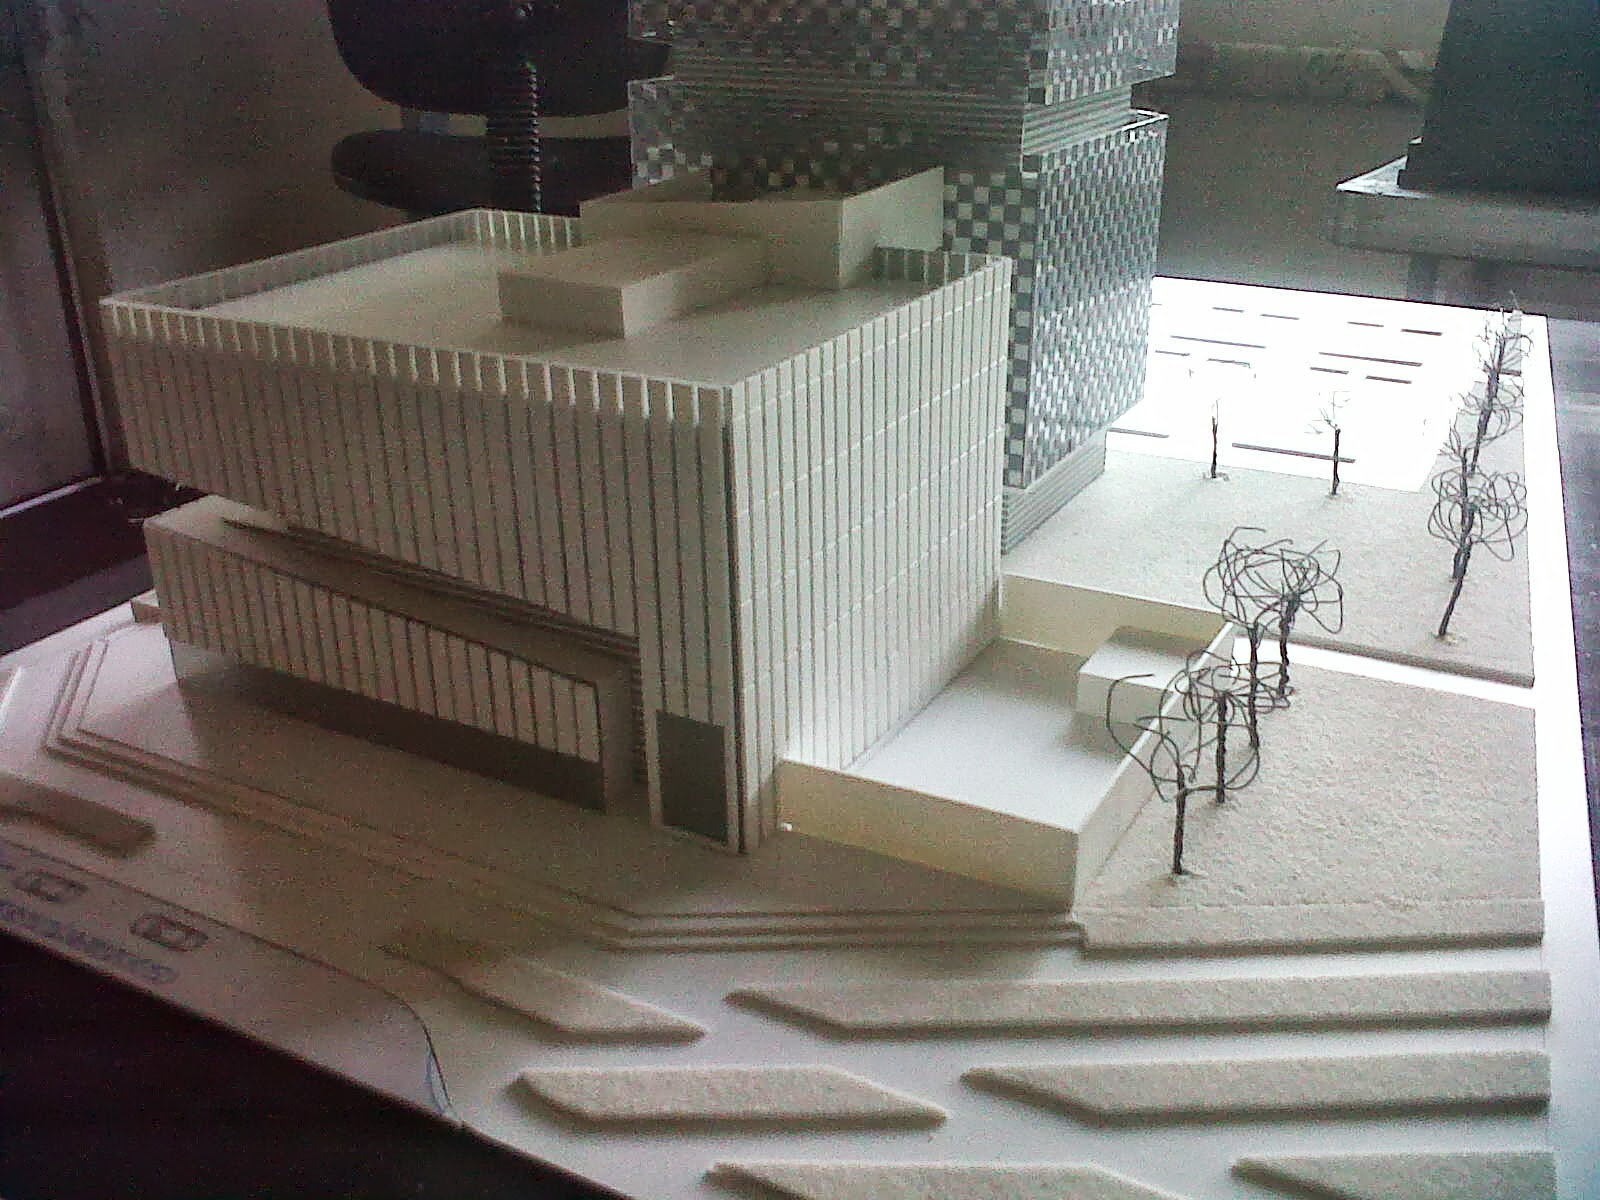 Maquetas para tesis de arquitectura for Tesis de arquitectura ejemplos